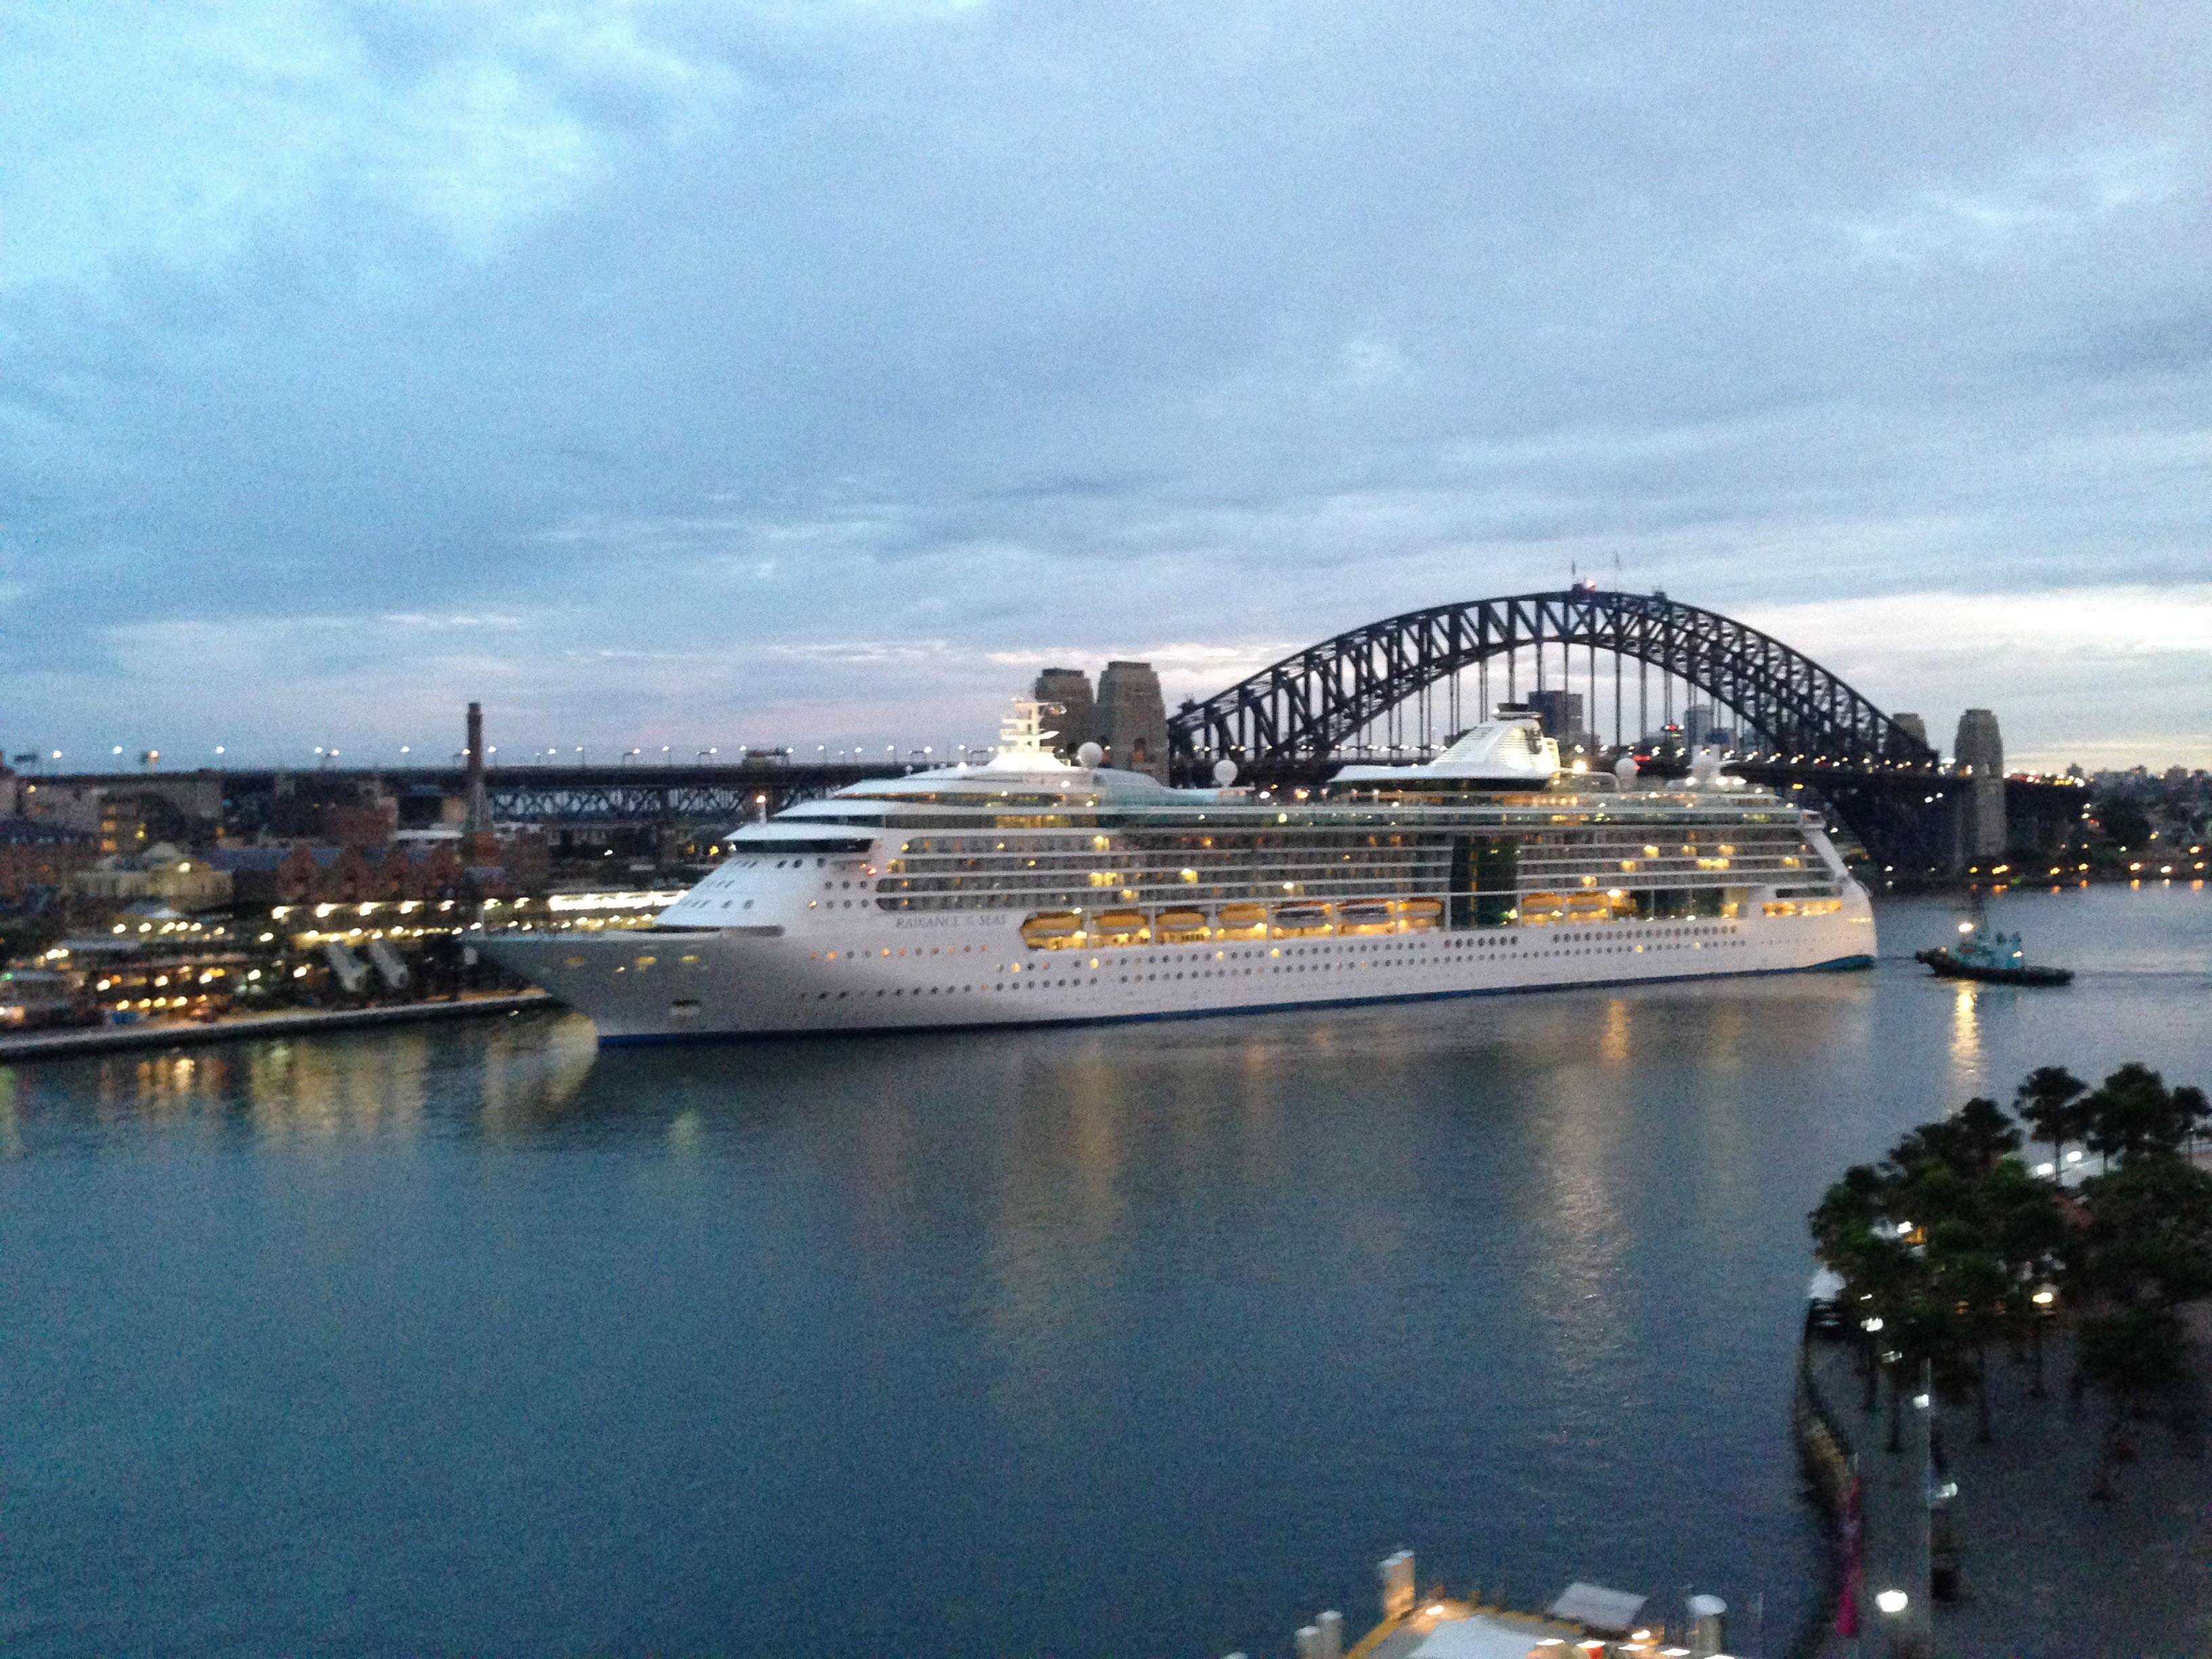 004_Australia_Radiance_in_port